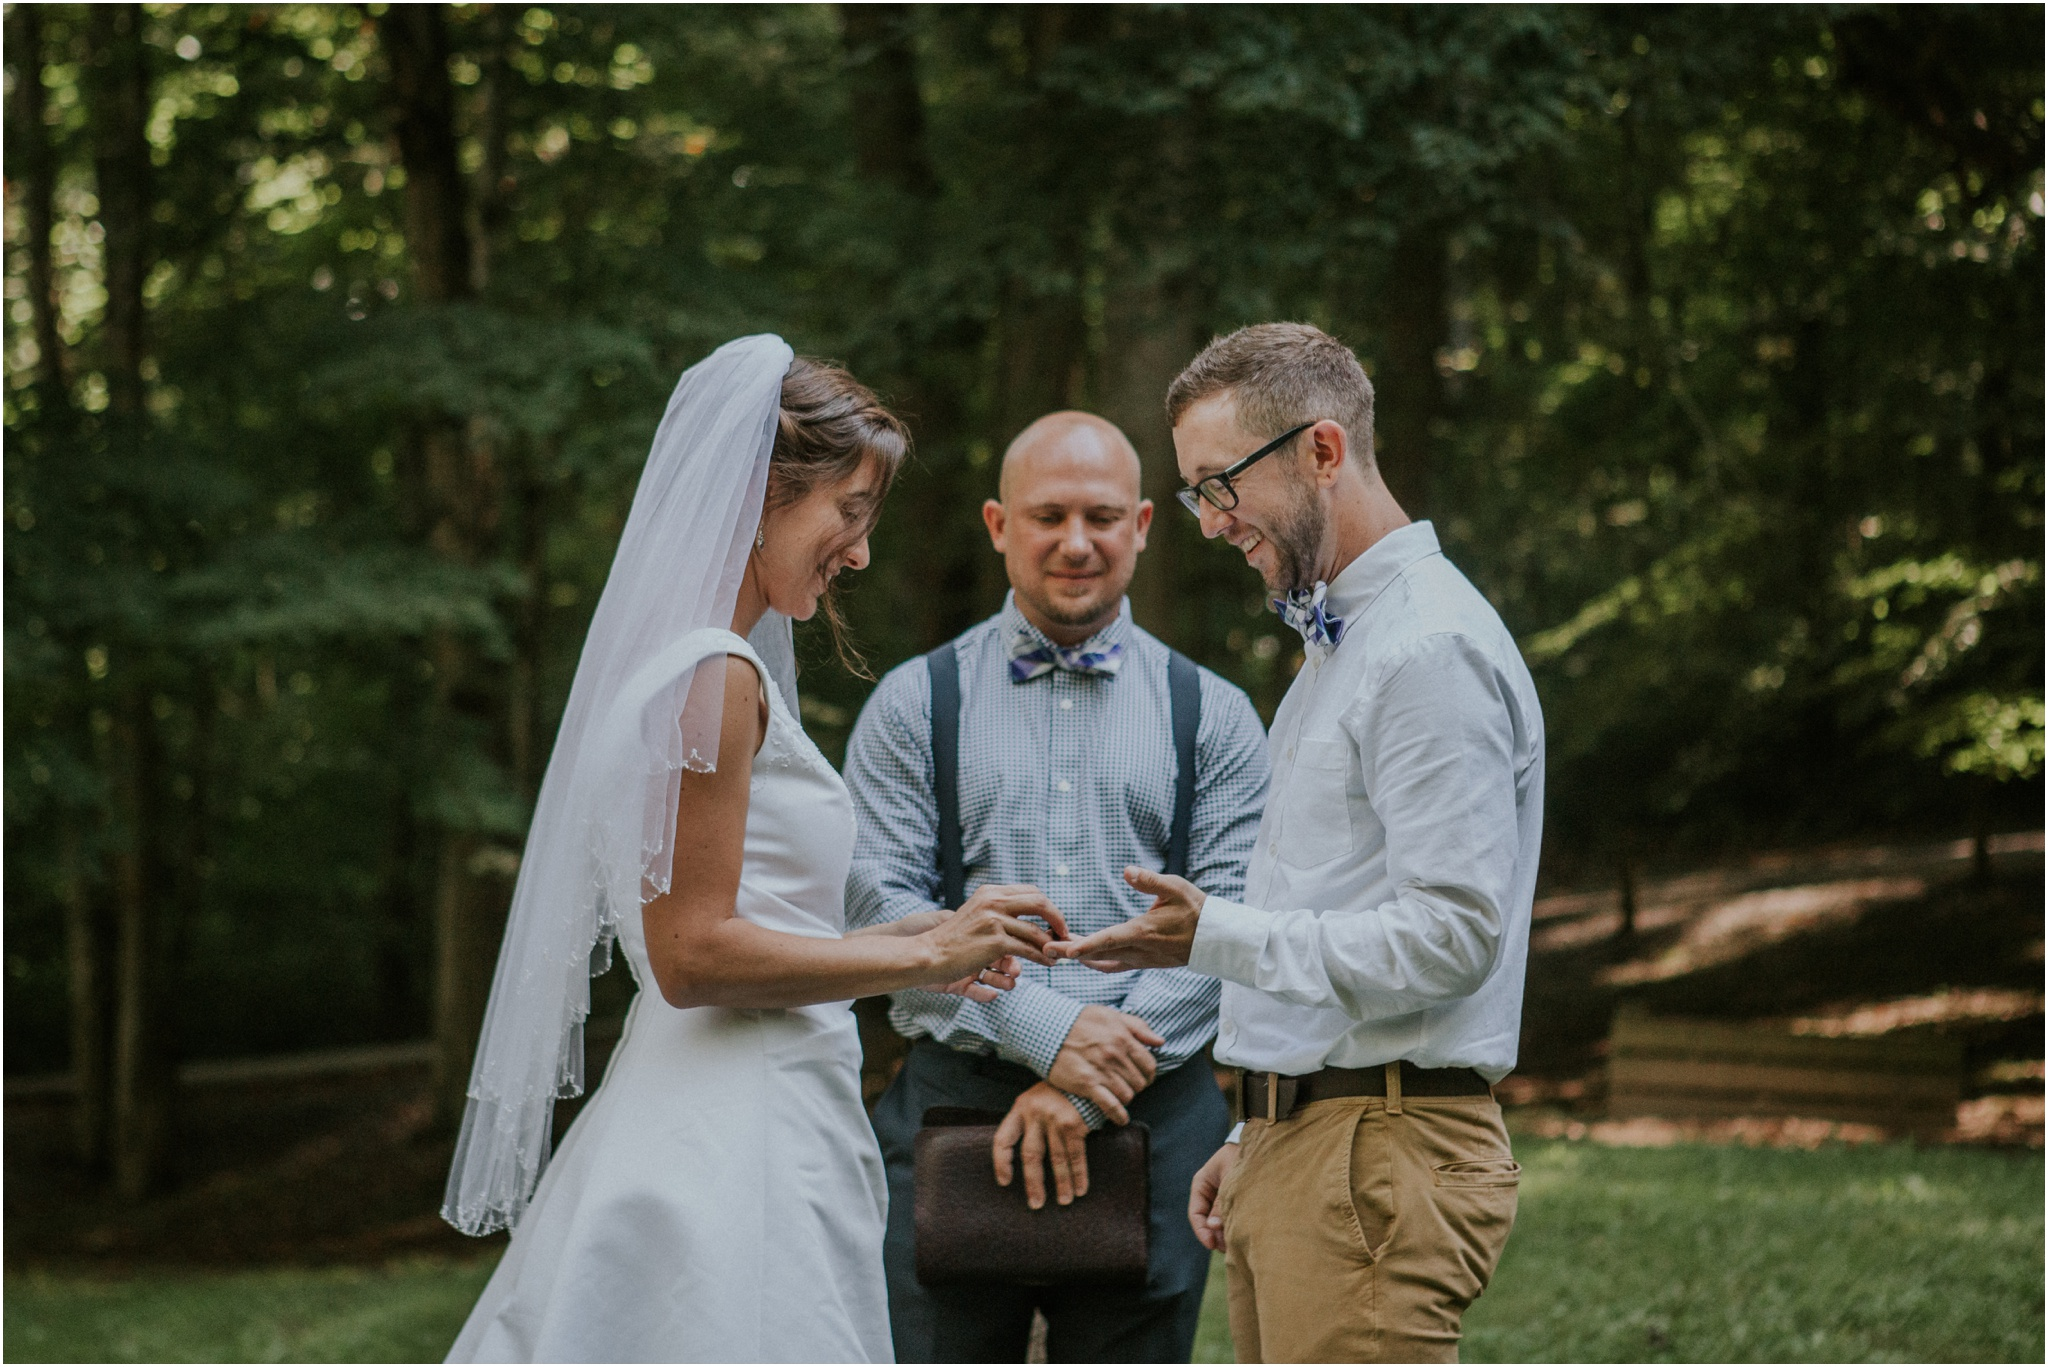 sugar-hollow-park-bristol-virginia-wedding-intimate-woodsy-black-forest-ceremony-adventurous-couple_0028.jpg